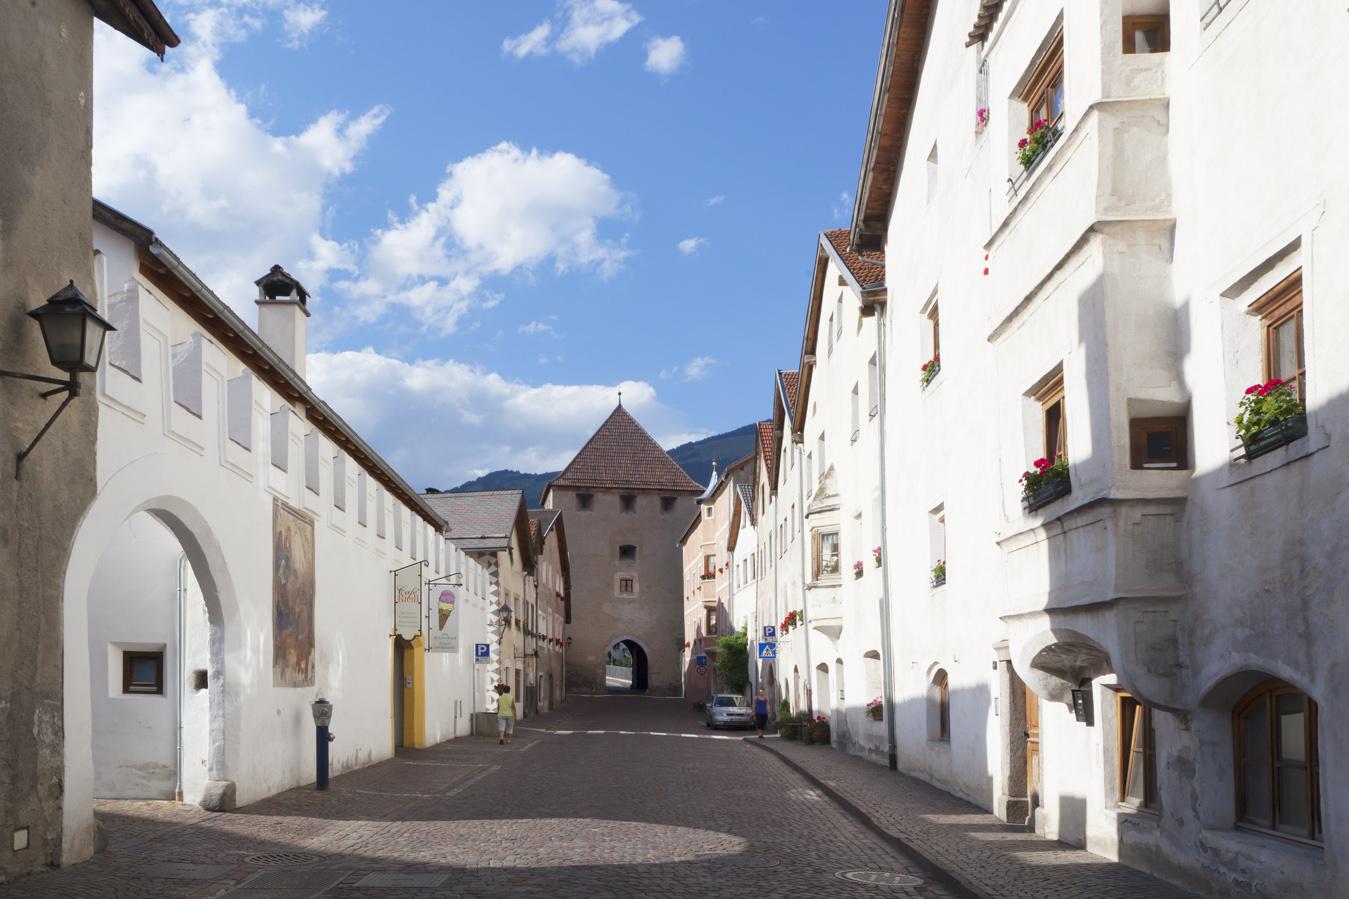 Glorenza, la piccola cittá medievale